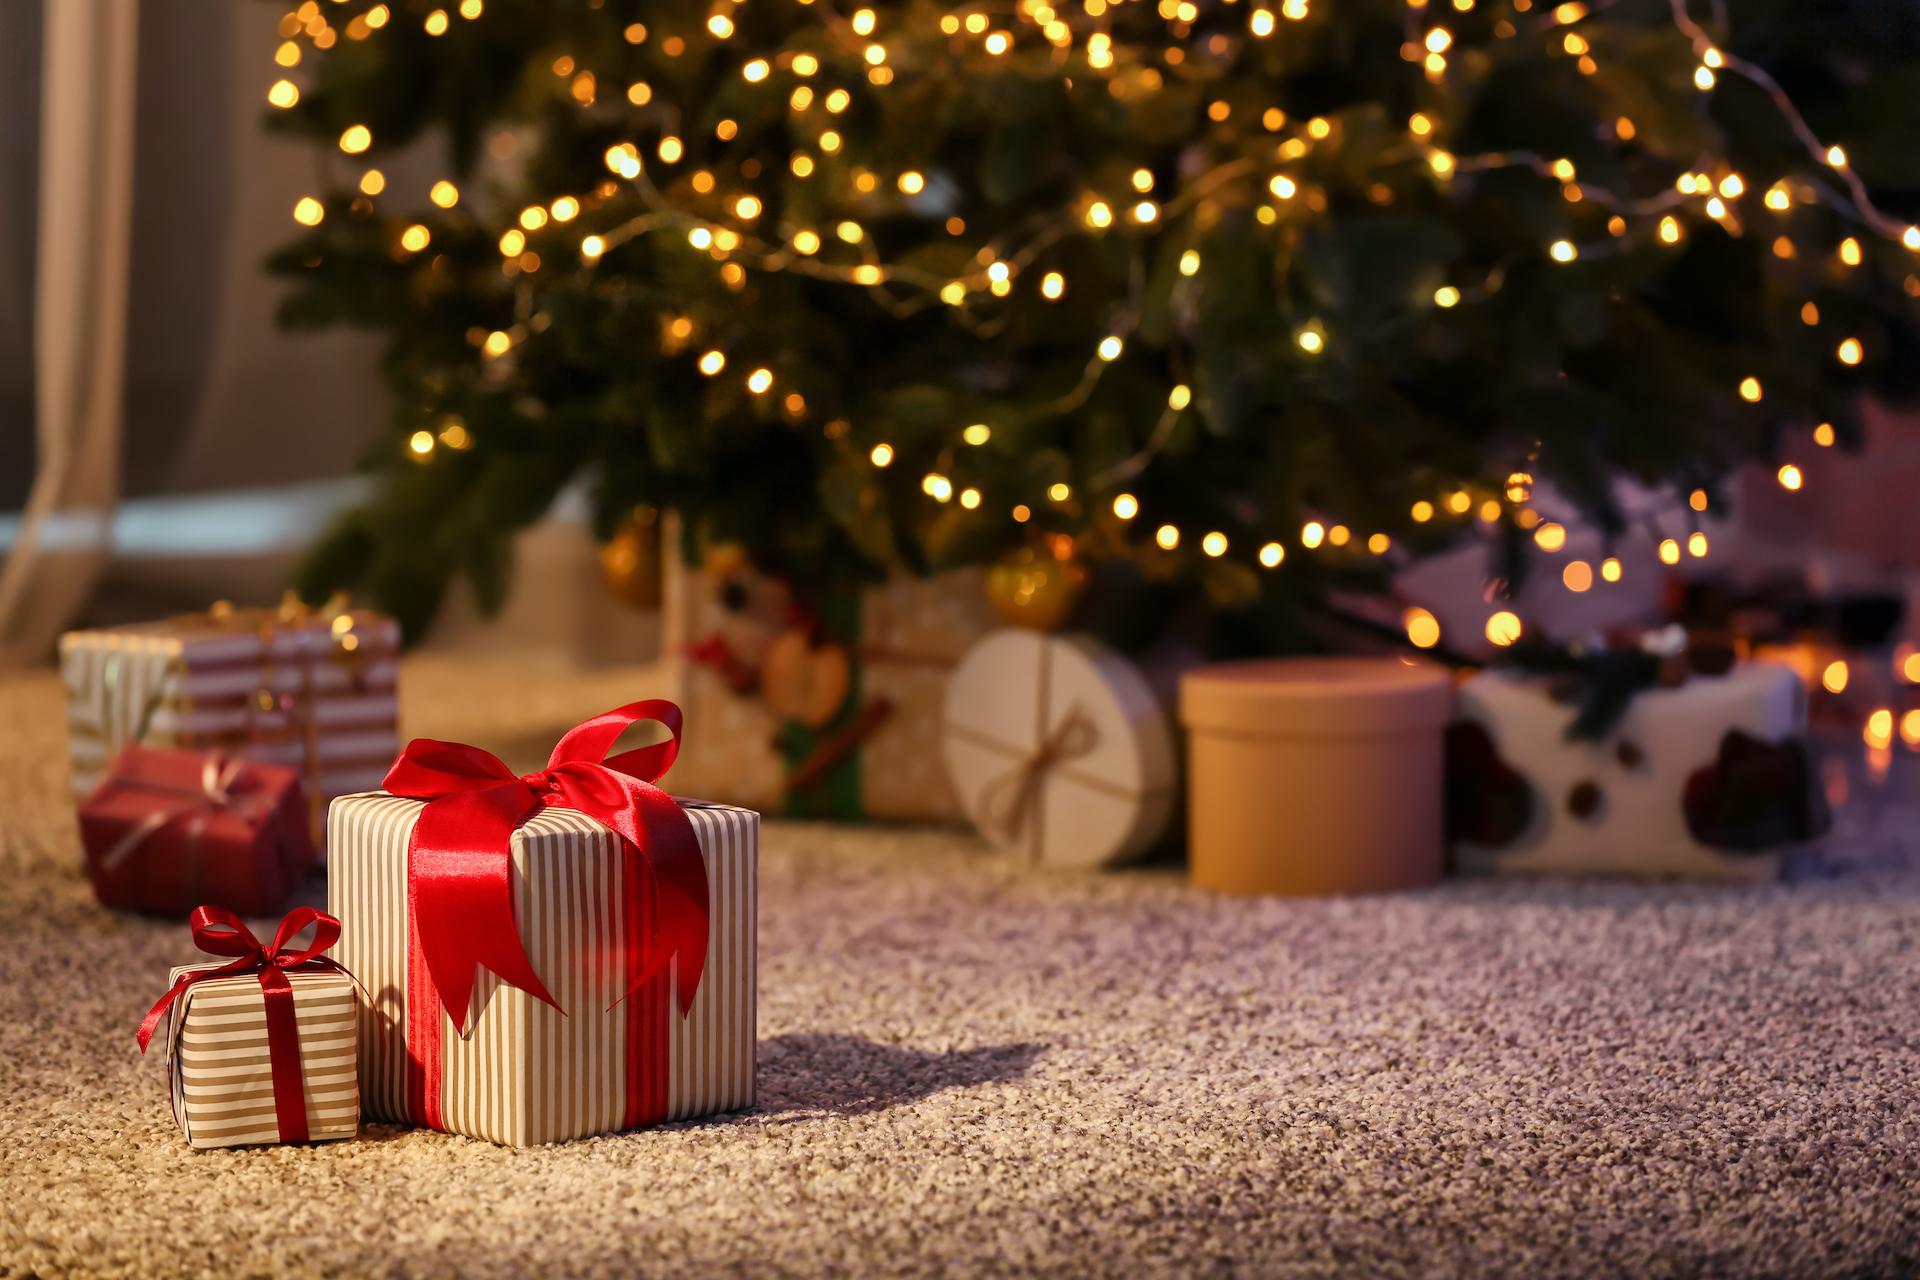 SHOPAHOLIC SANTA: 5 Christmas gifts to buy this year